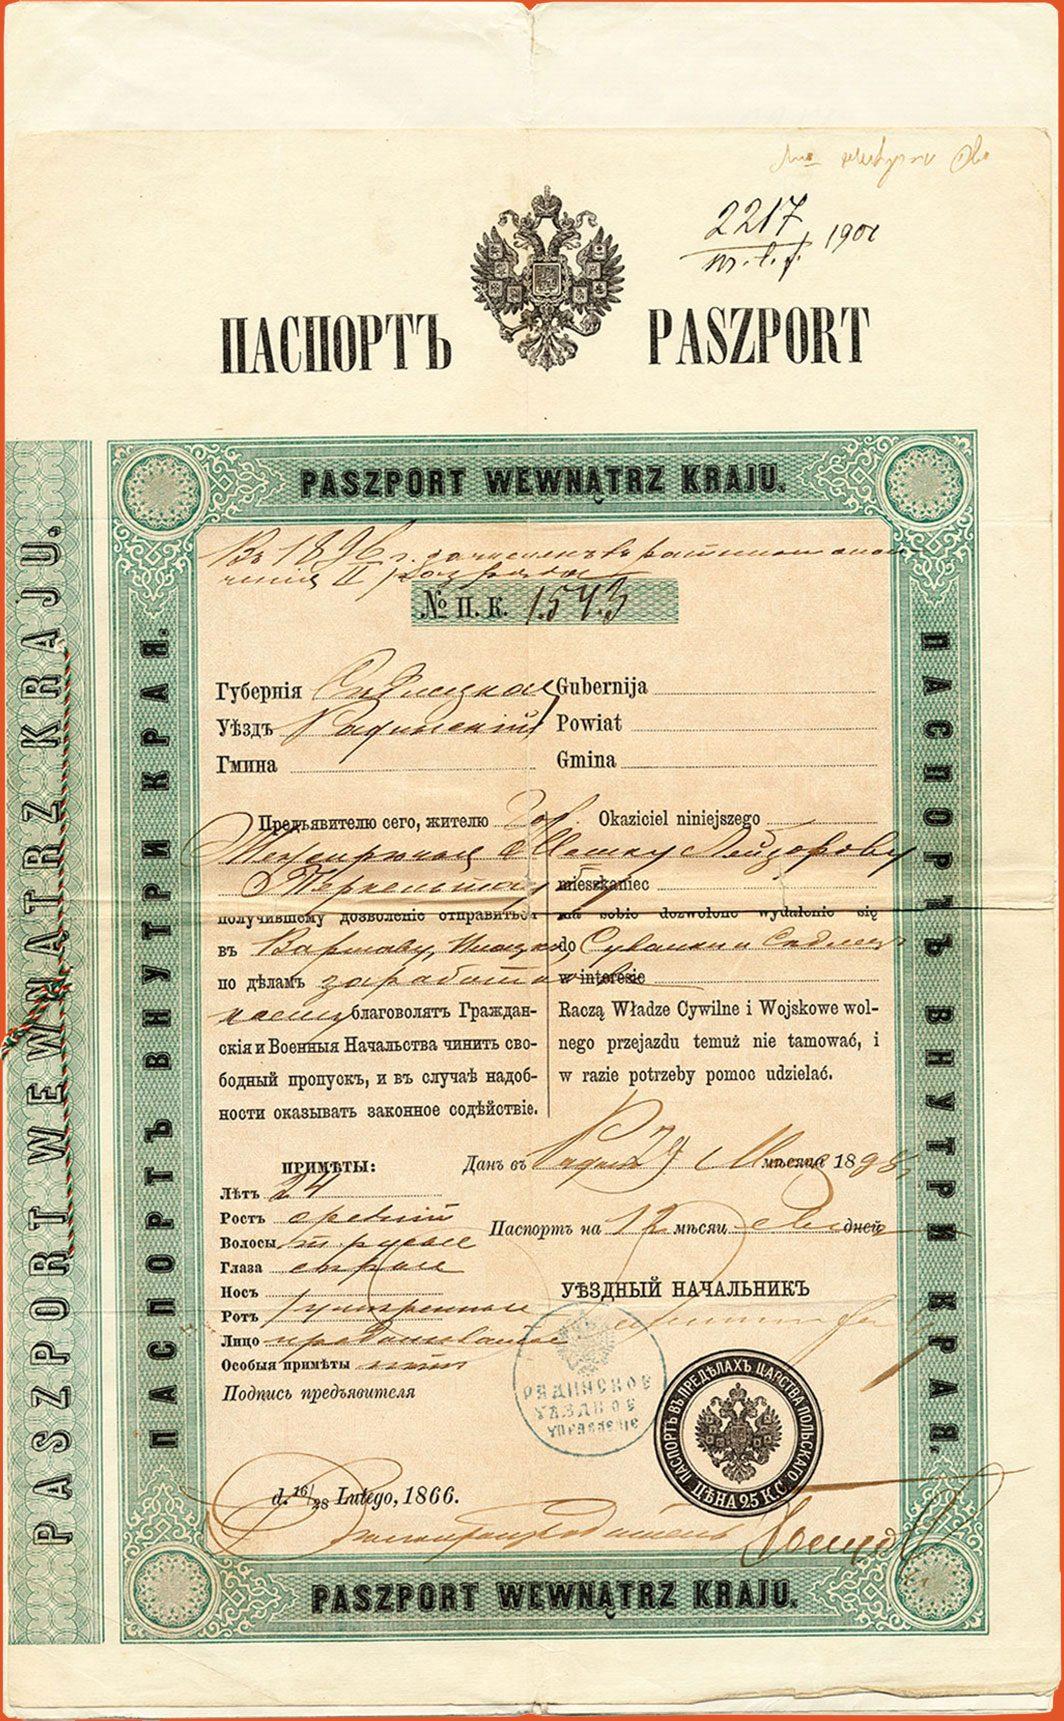 Passport in Russian permitting travel